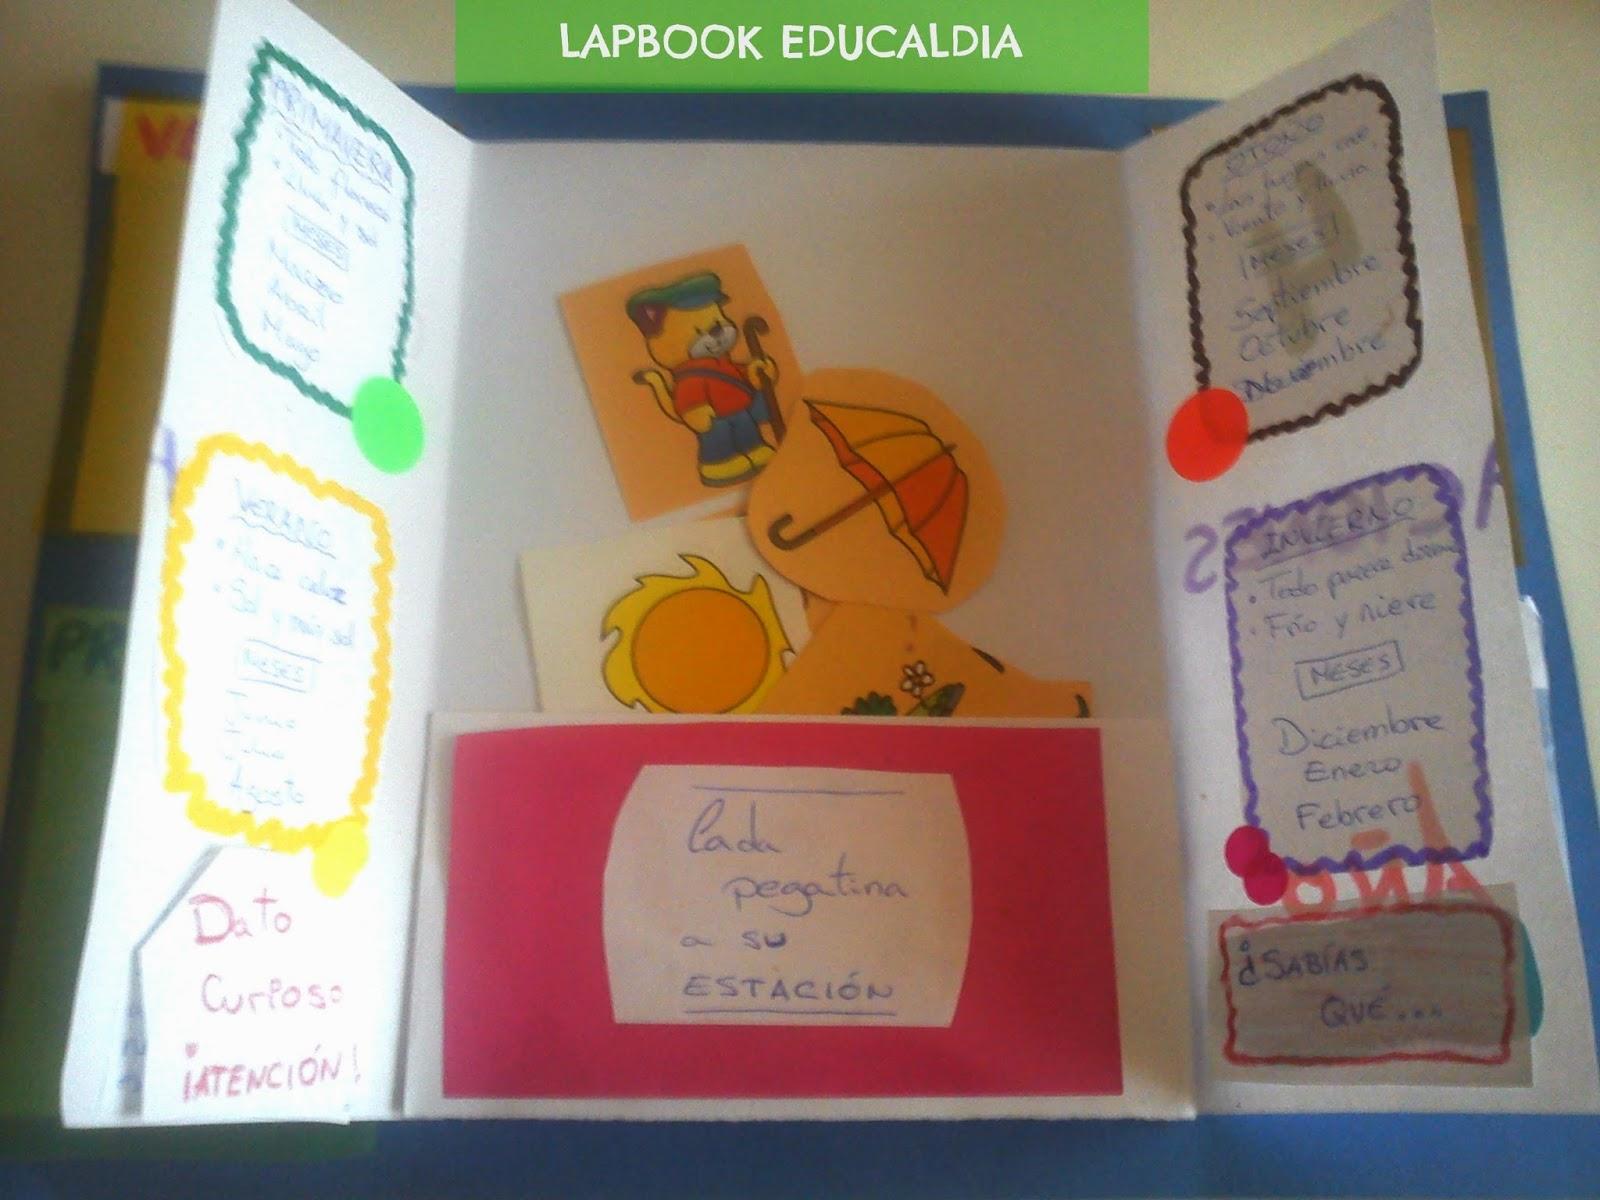 lapbook, homeschooling, educacion en familia